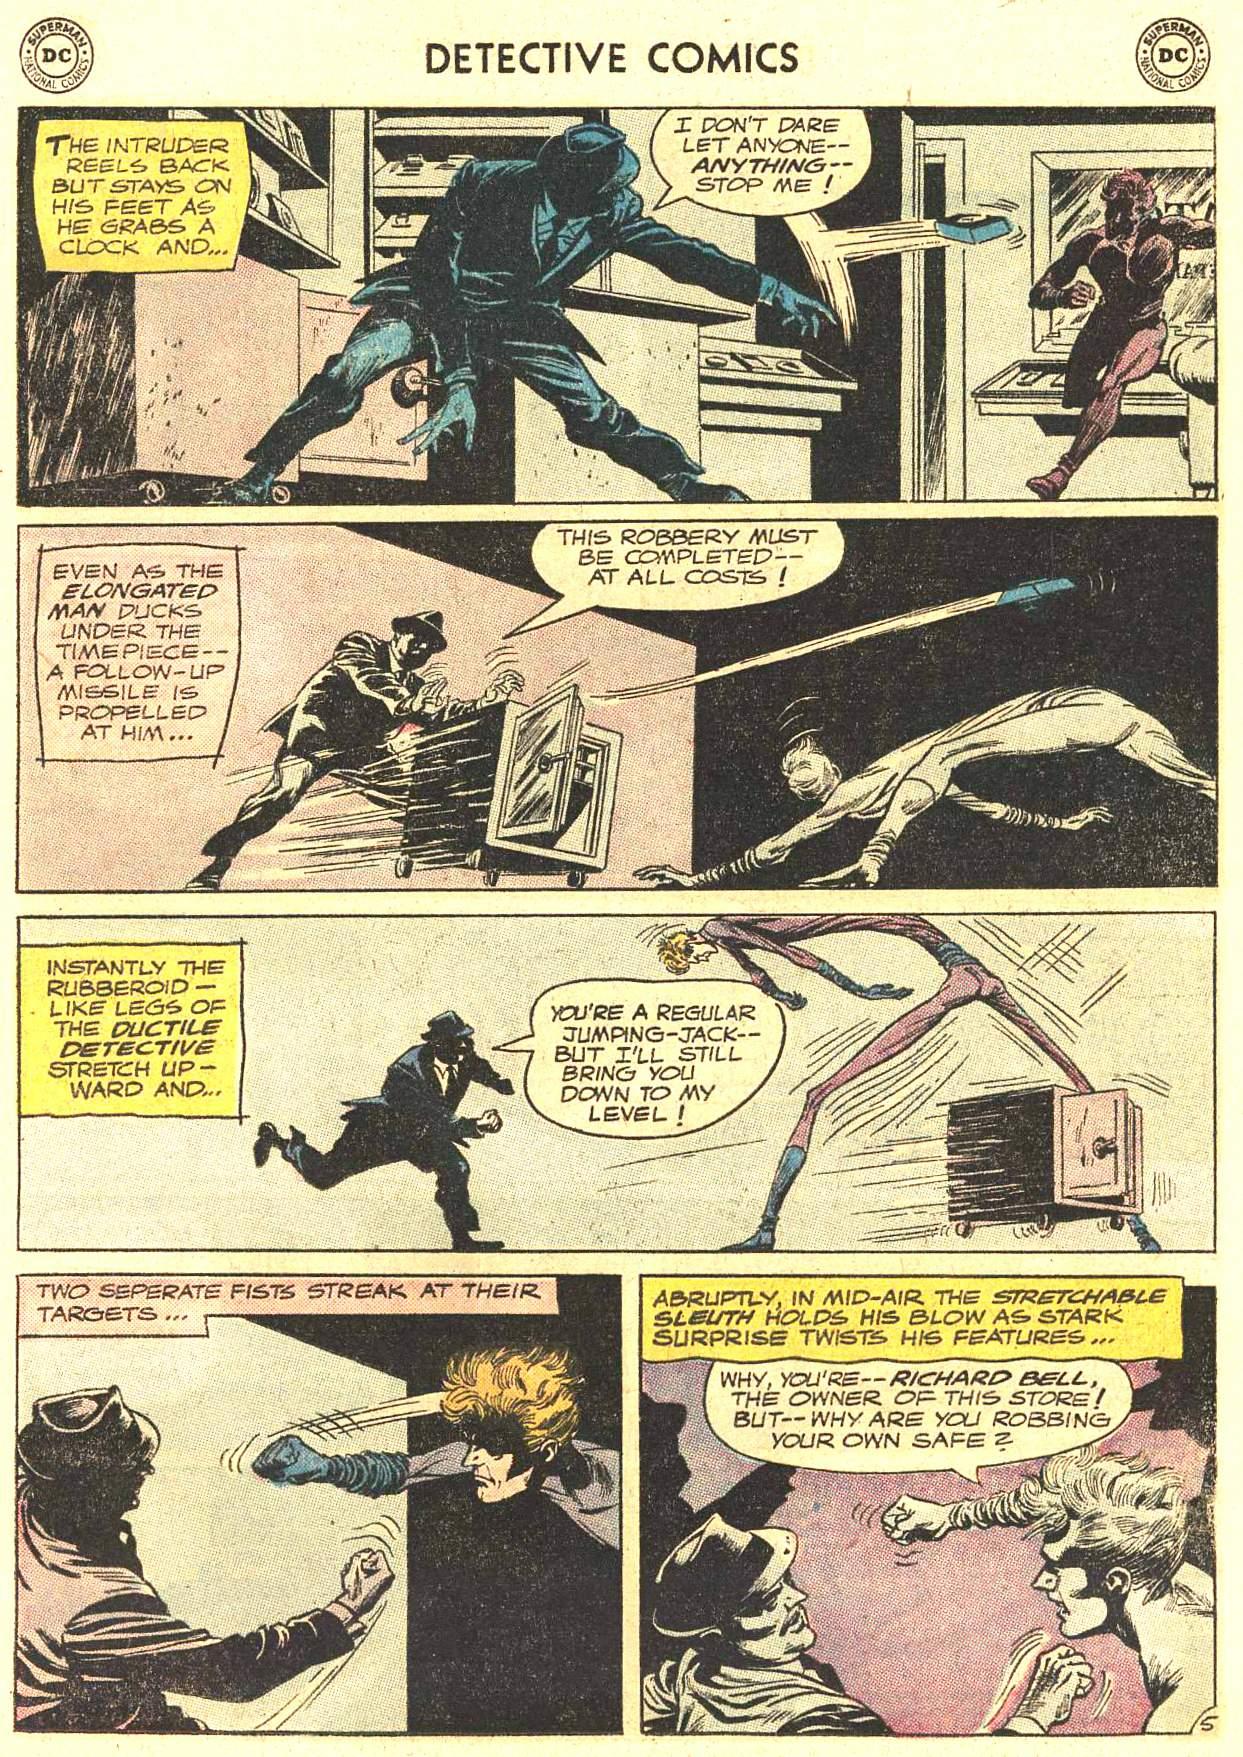 Detective Comics (1937) 333 Page 25